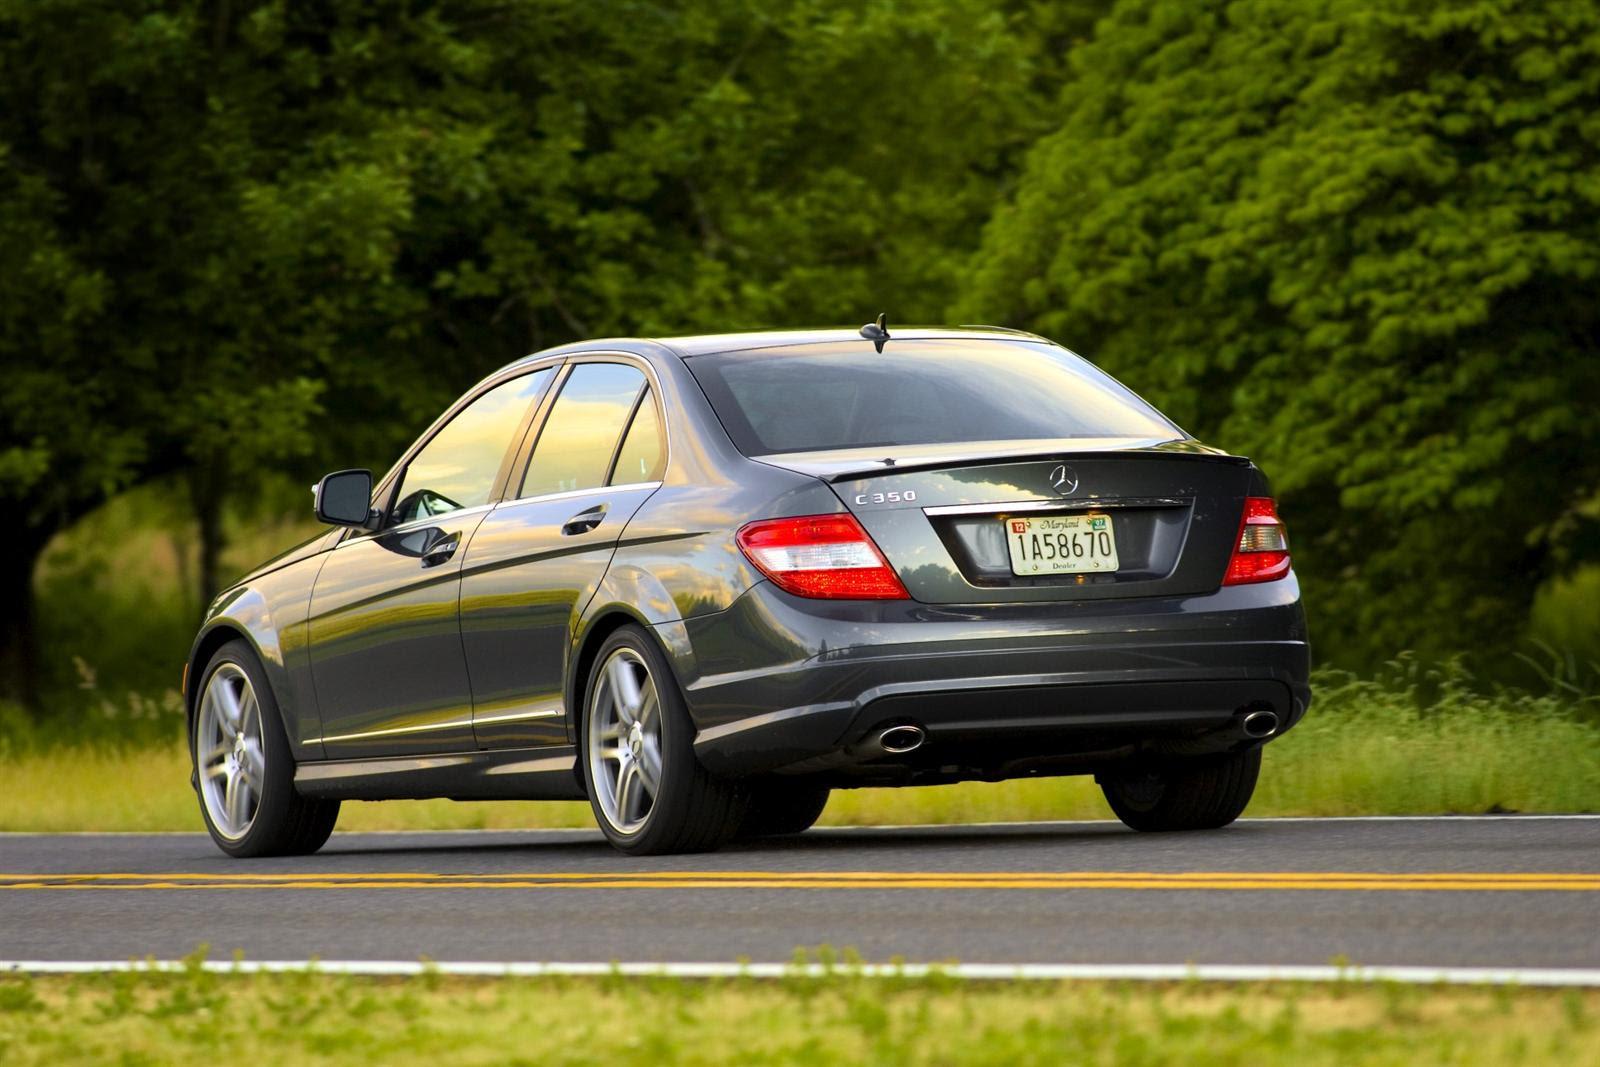 2009 Mercedes-Benz C-Class Images. Photo mercedes-Benz_C ...